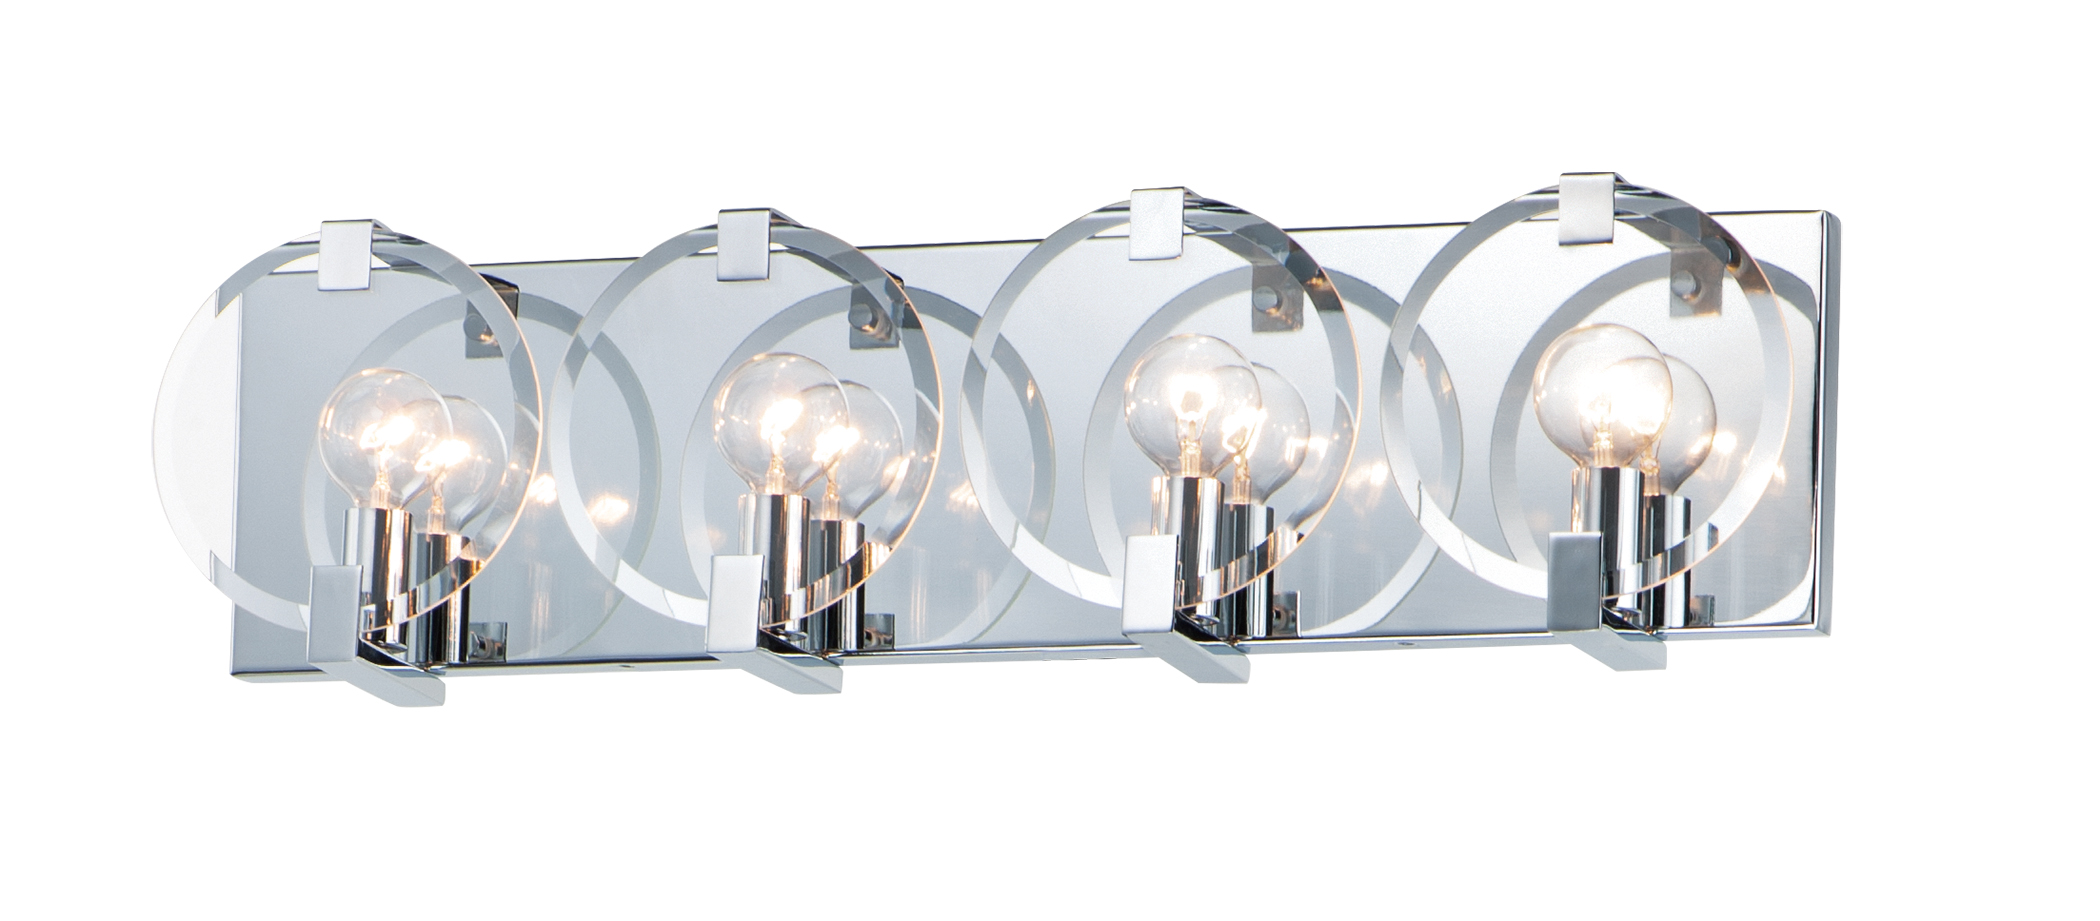 Looking Glass 4-Light Wall Sconce | Maxim Lighting